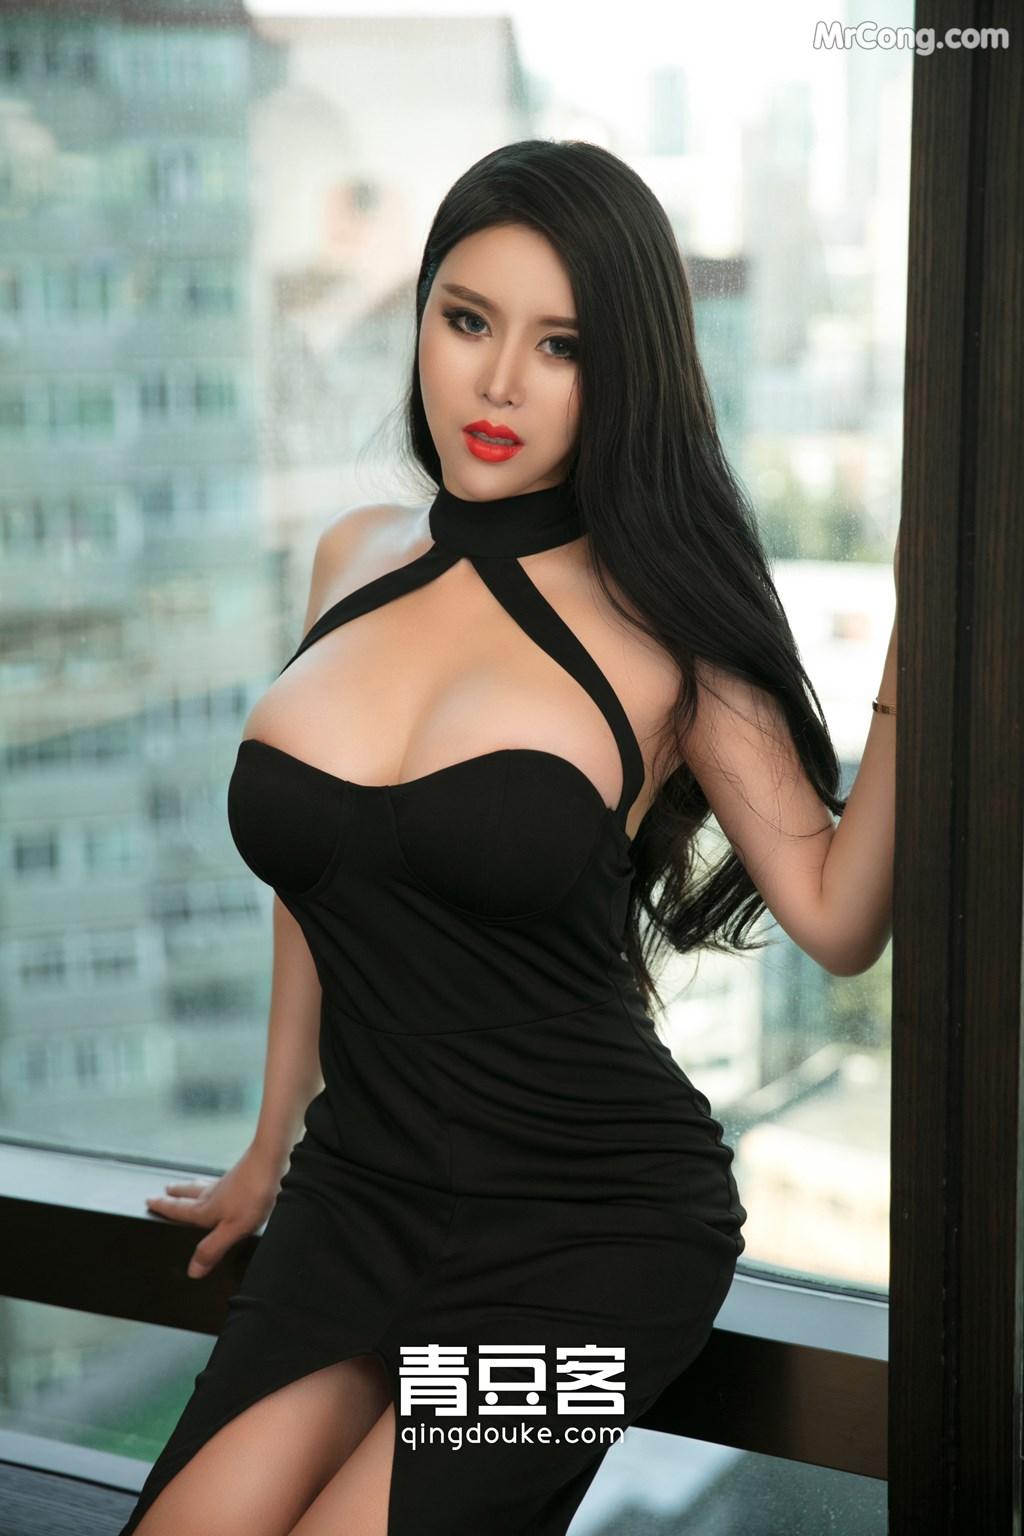 Image QingDouKe-2017-11-05-Ke-Rui-Na-MrCong.com-011 in post QingDouKe 2017-11-05: Người mẫu Ke Rui Na (可蕊娜) (48 ảnh)